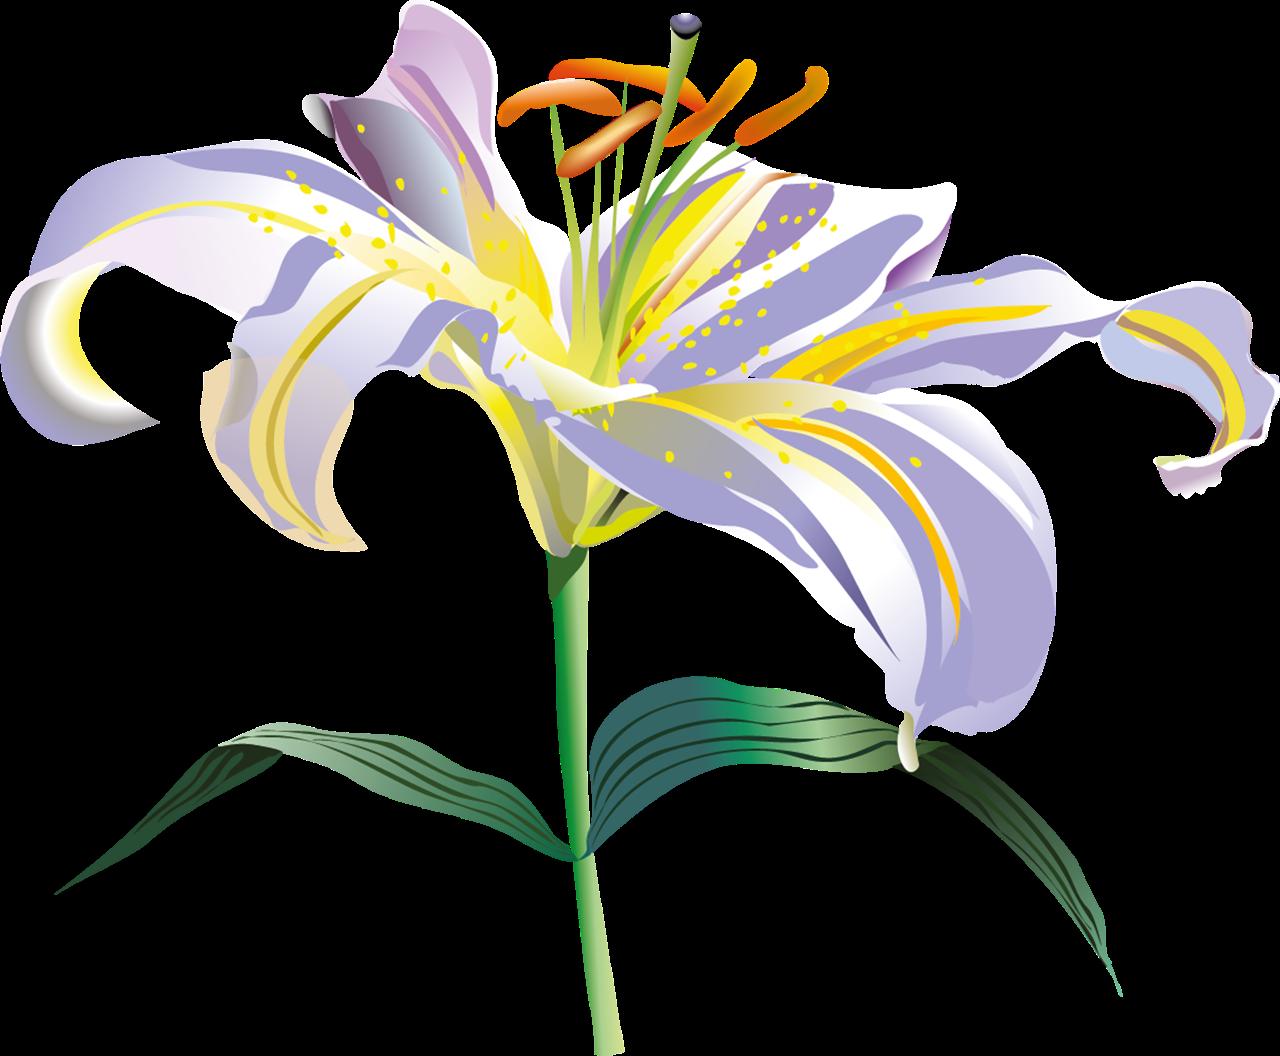 Flores vectoriales con fondo transparente png Arte digital - Imagenes De Flores Transparentes